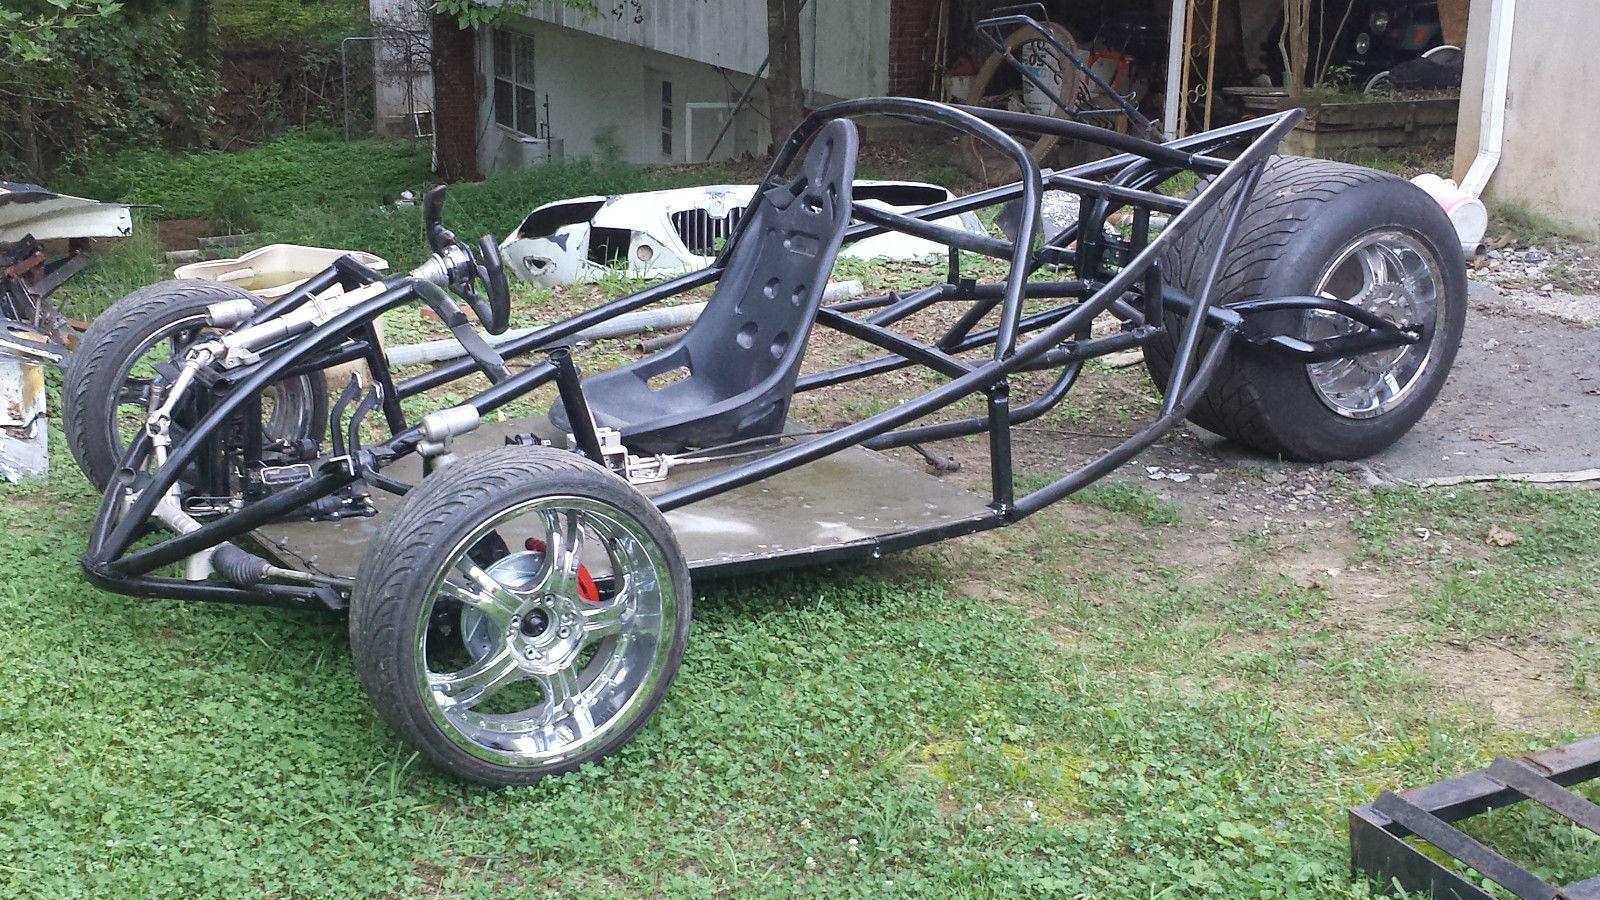 Custom Reverse Trike Turbo Gsxr 1000 Project No Reserve